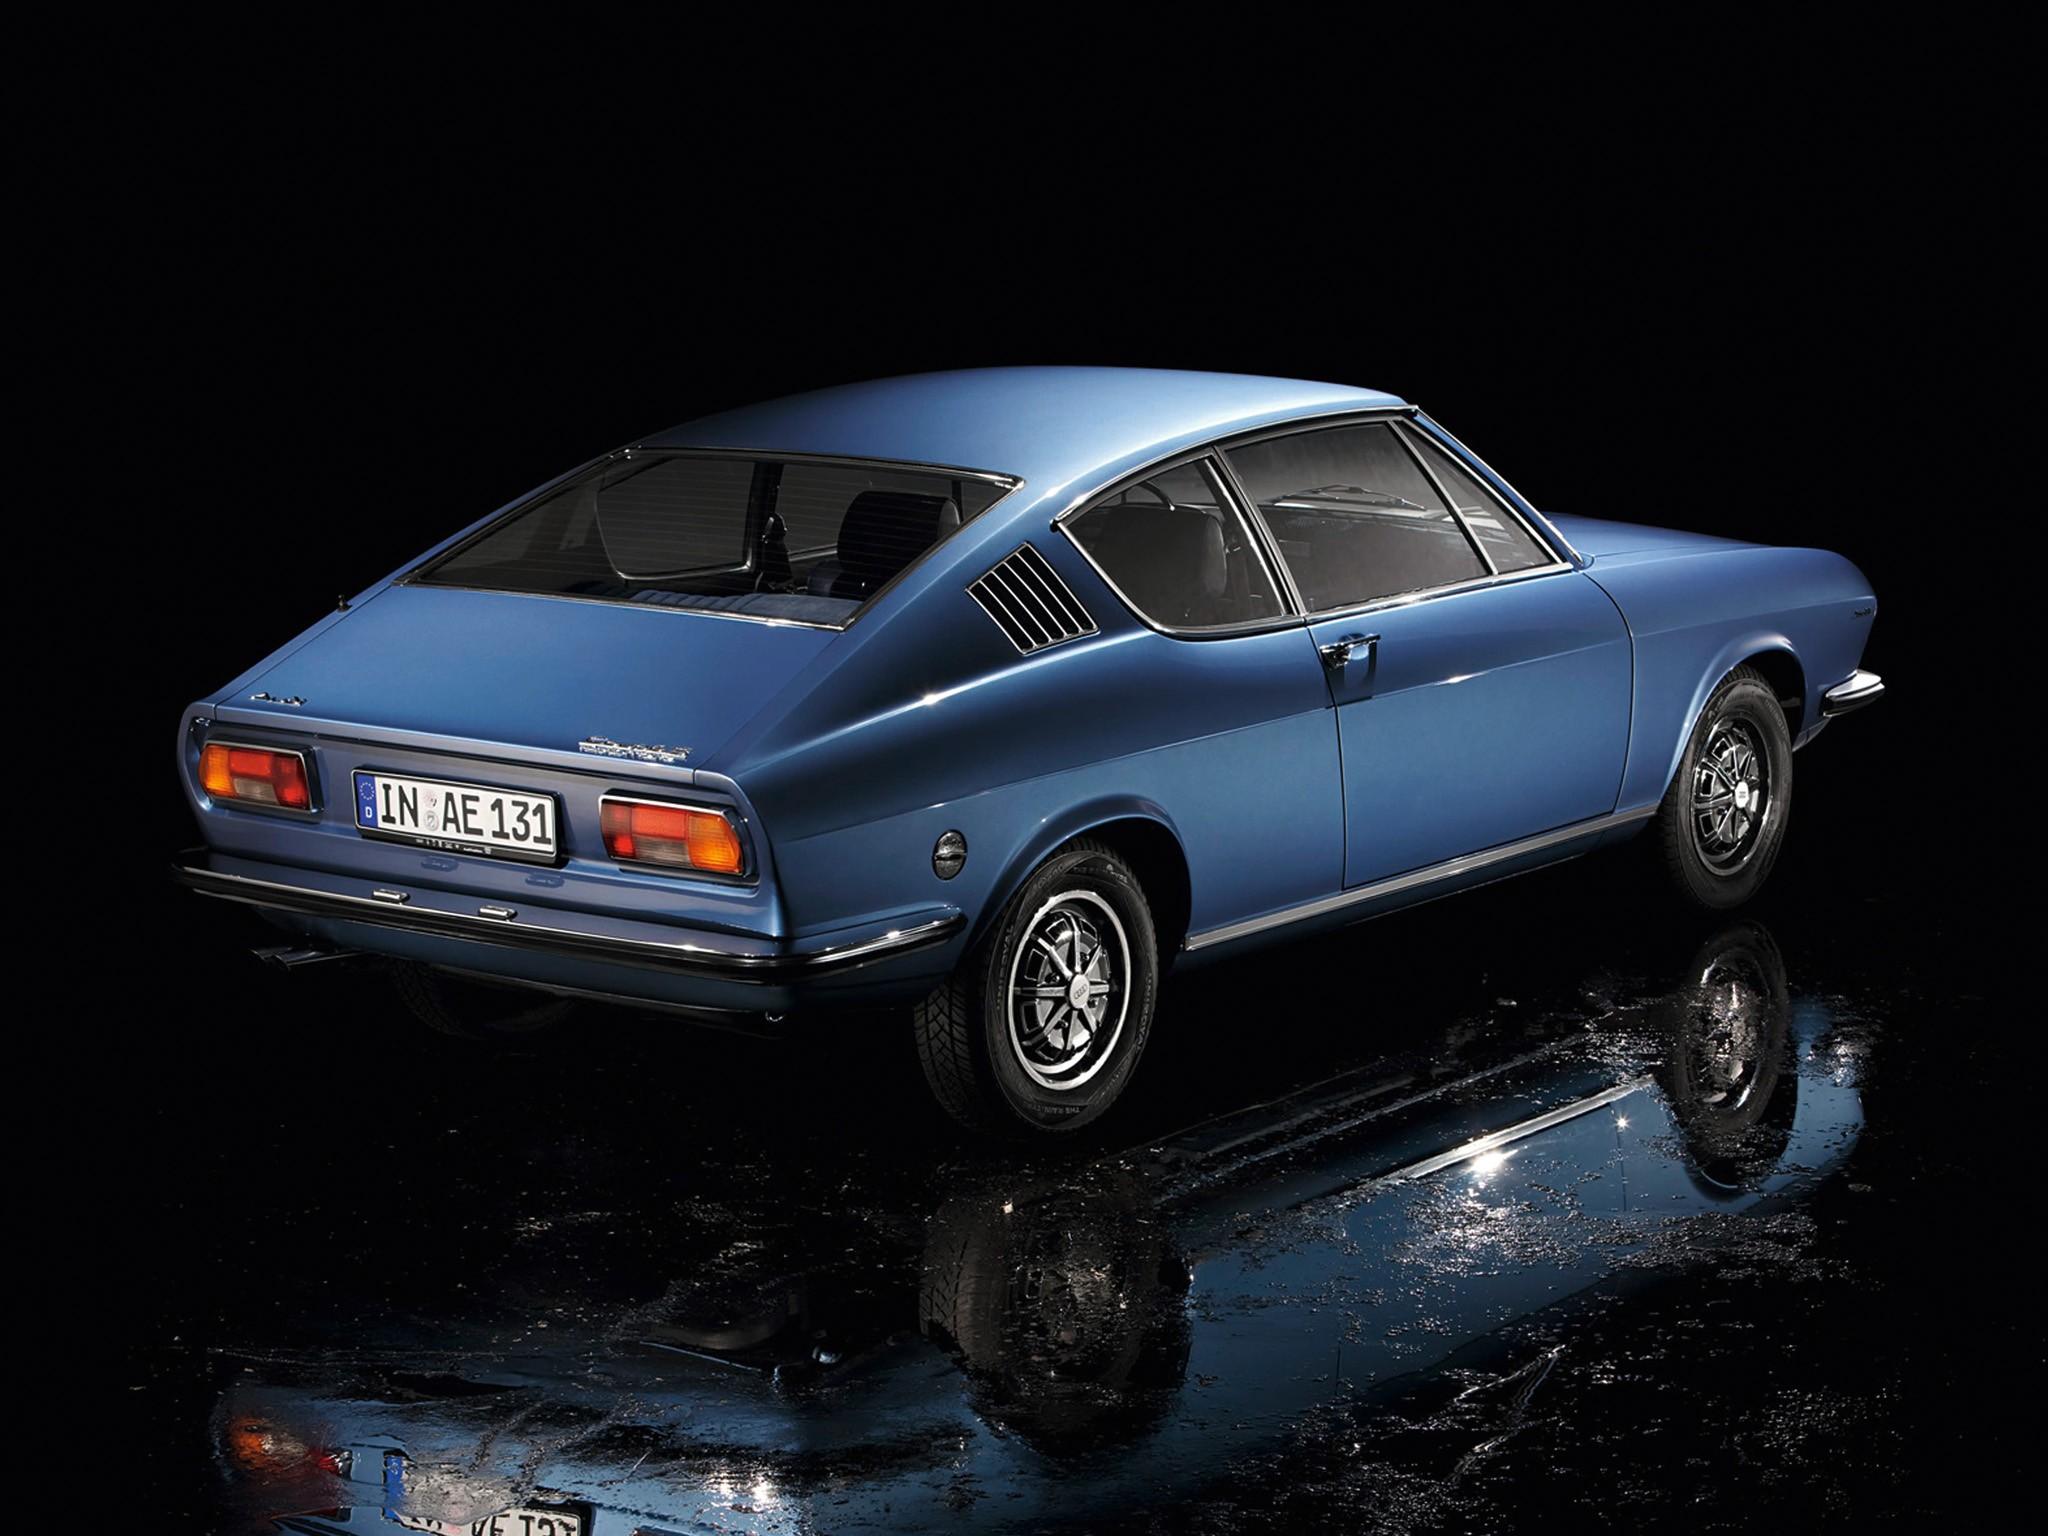 audi 100 coupe s 1970 1971 1972 1973 1974 1975 1976 autoevolution. Black Bedroom Furniture Sets. Home Design Ideas